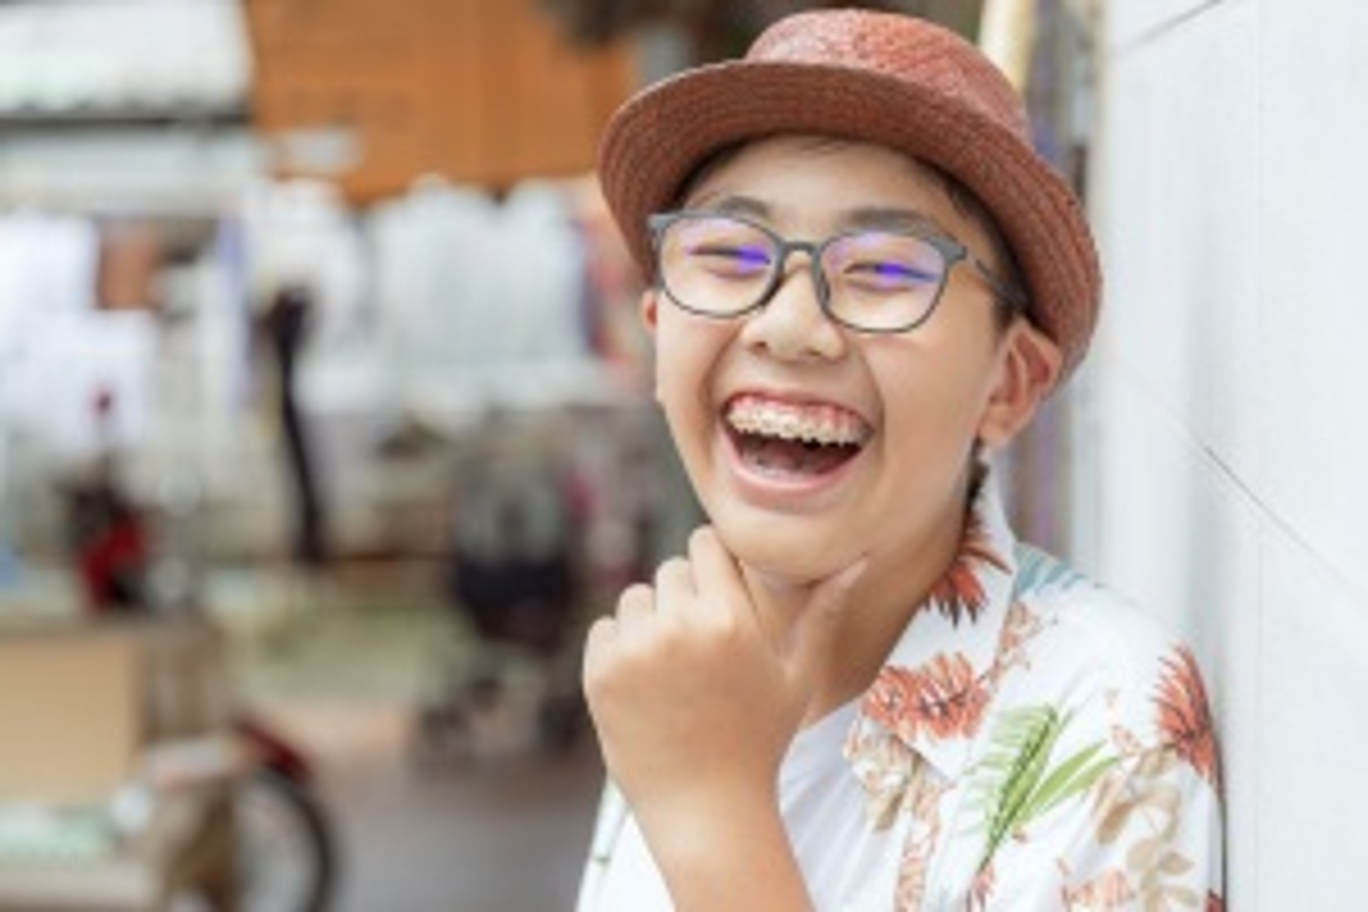 Teenage boy smiling with braces